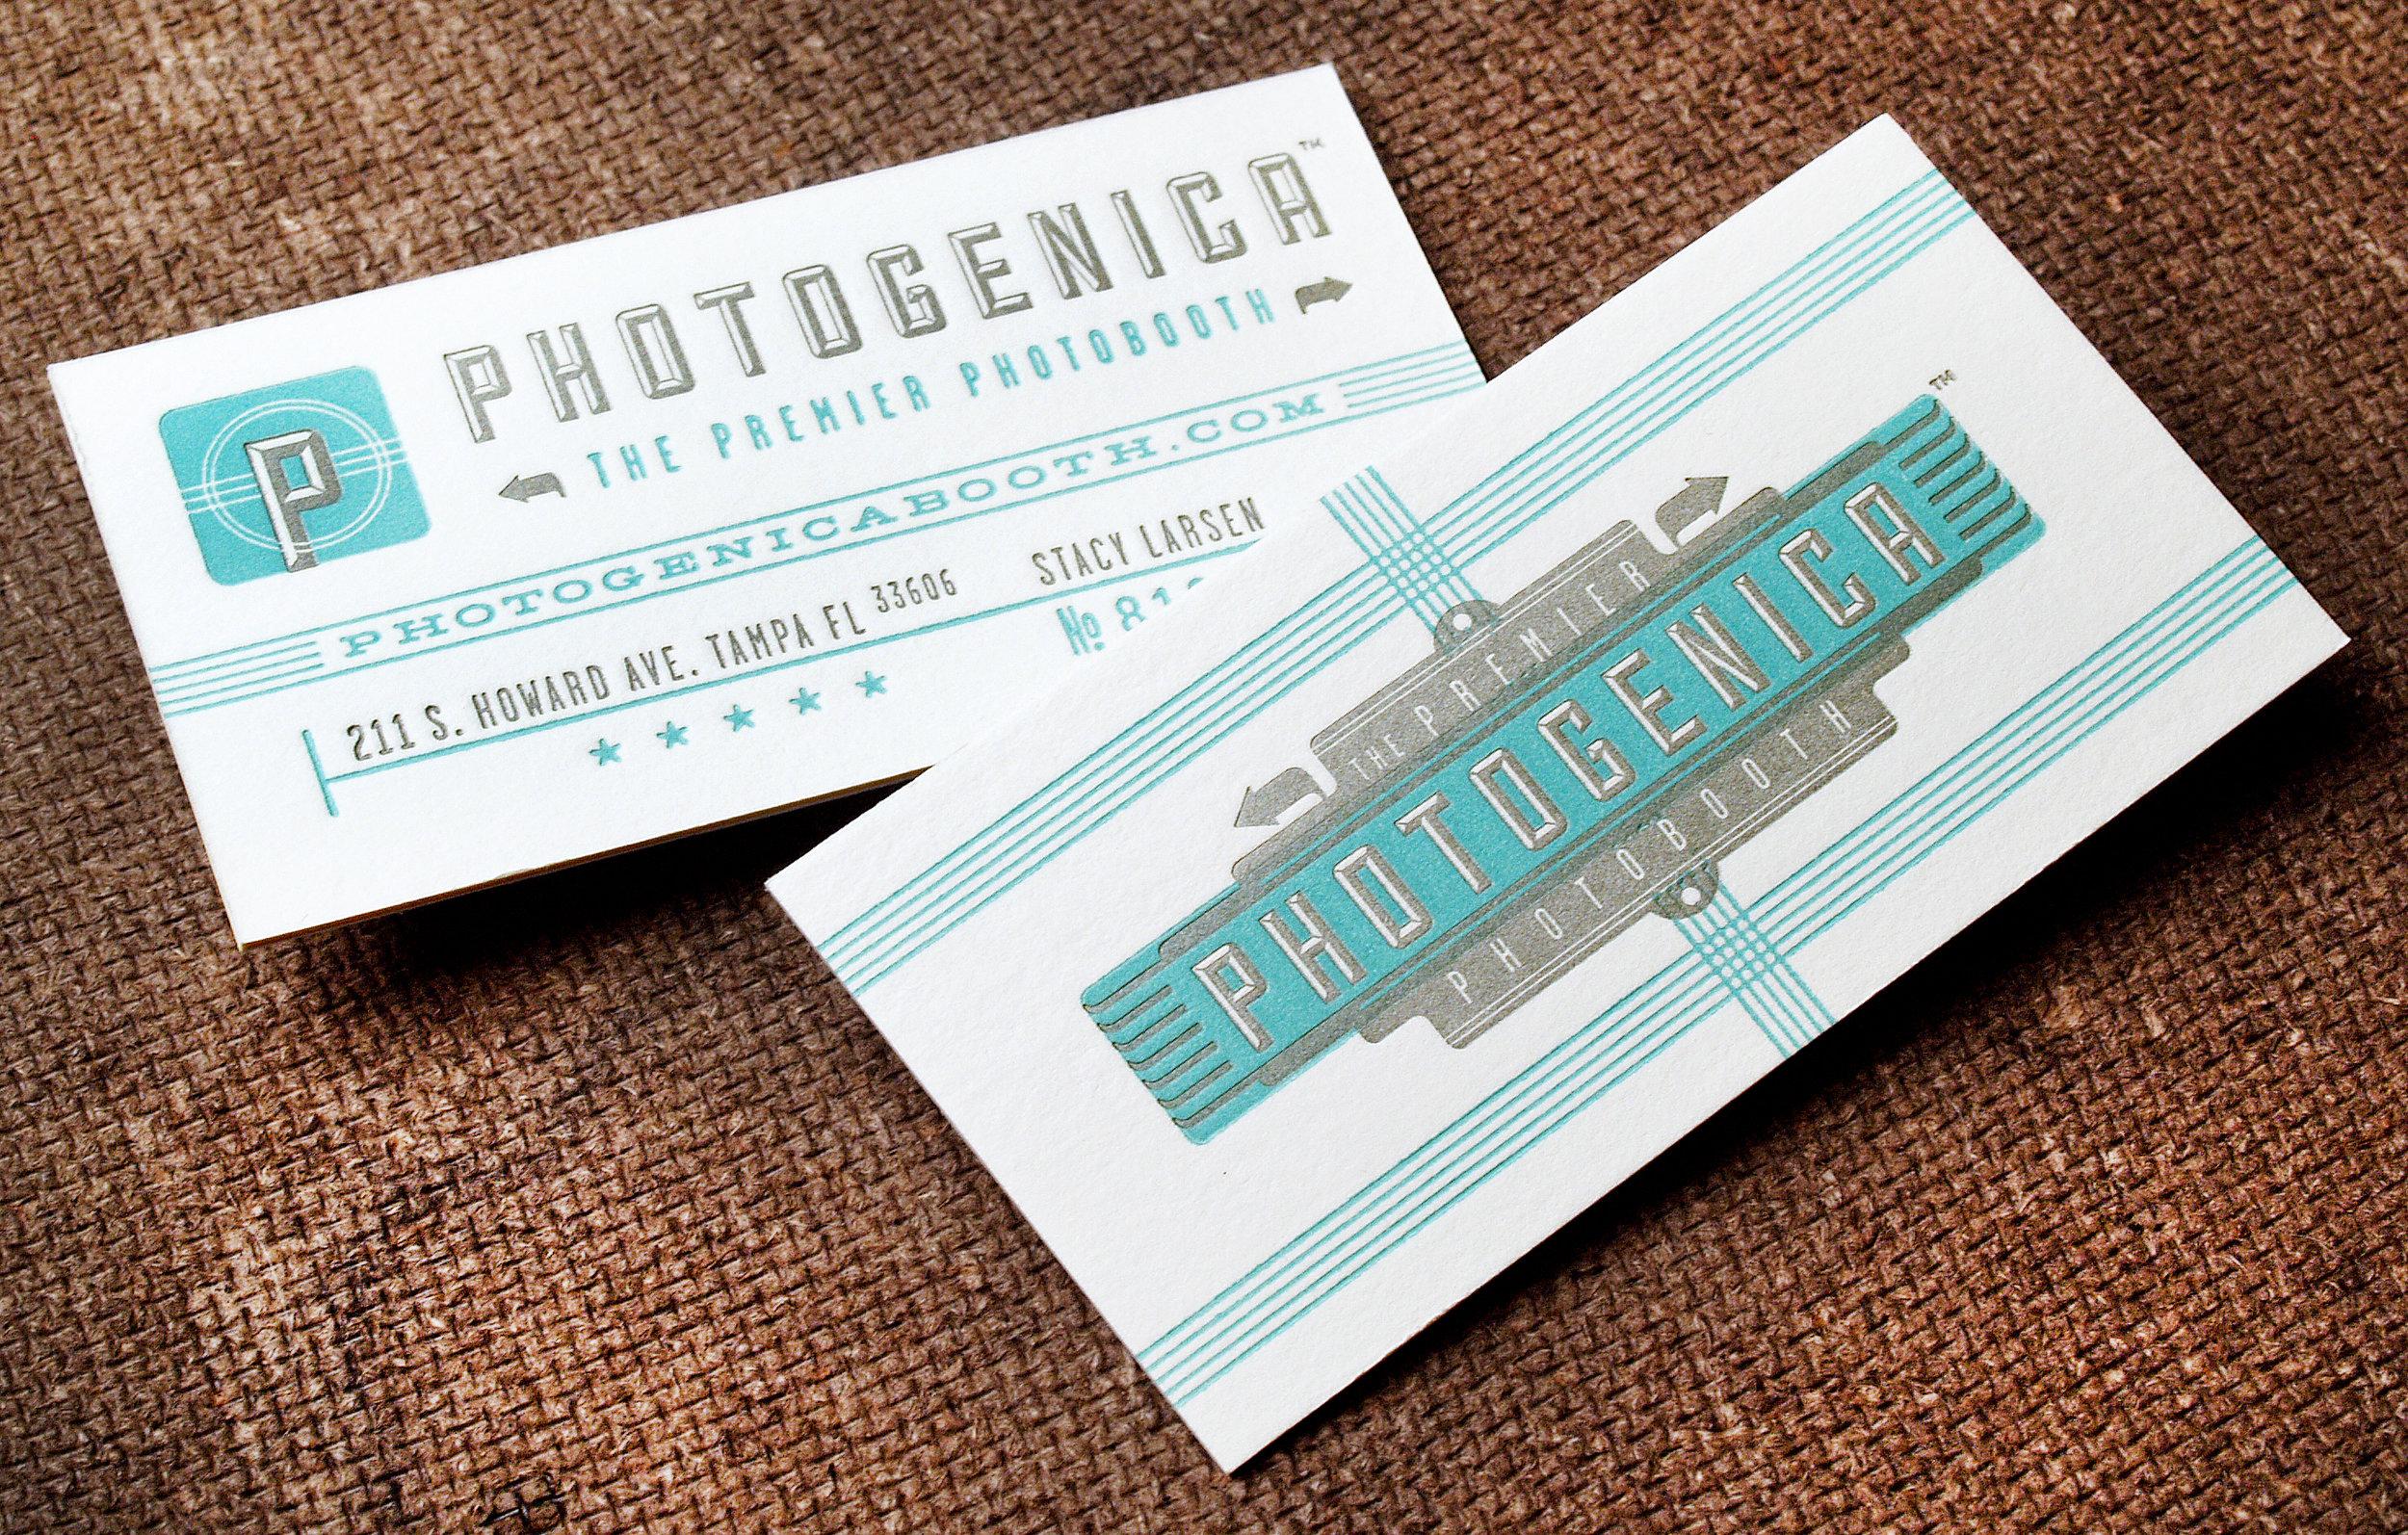 Photogenica Photobooth _ Funnel.tv | Eric Kass